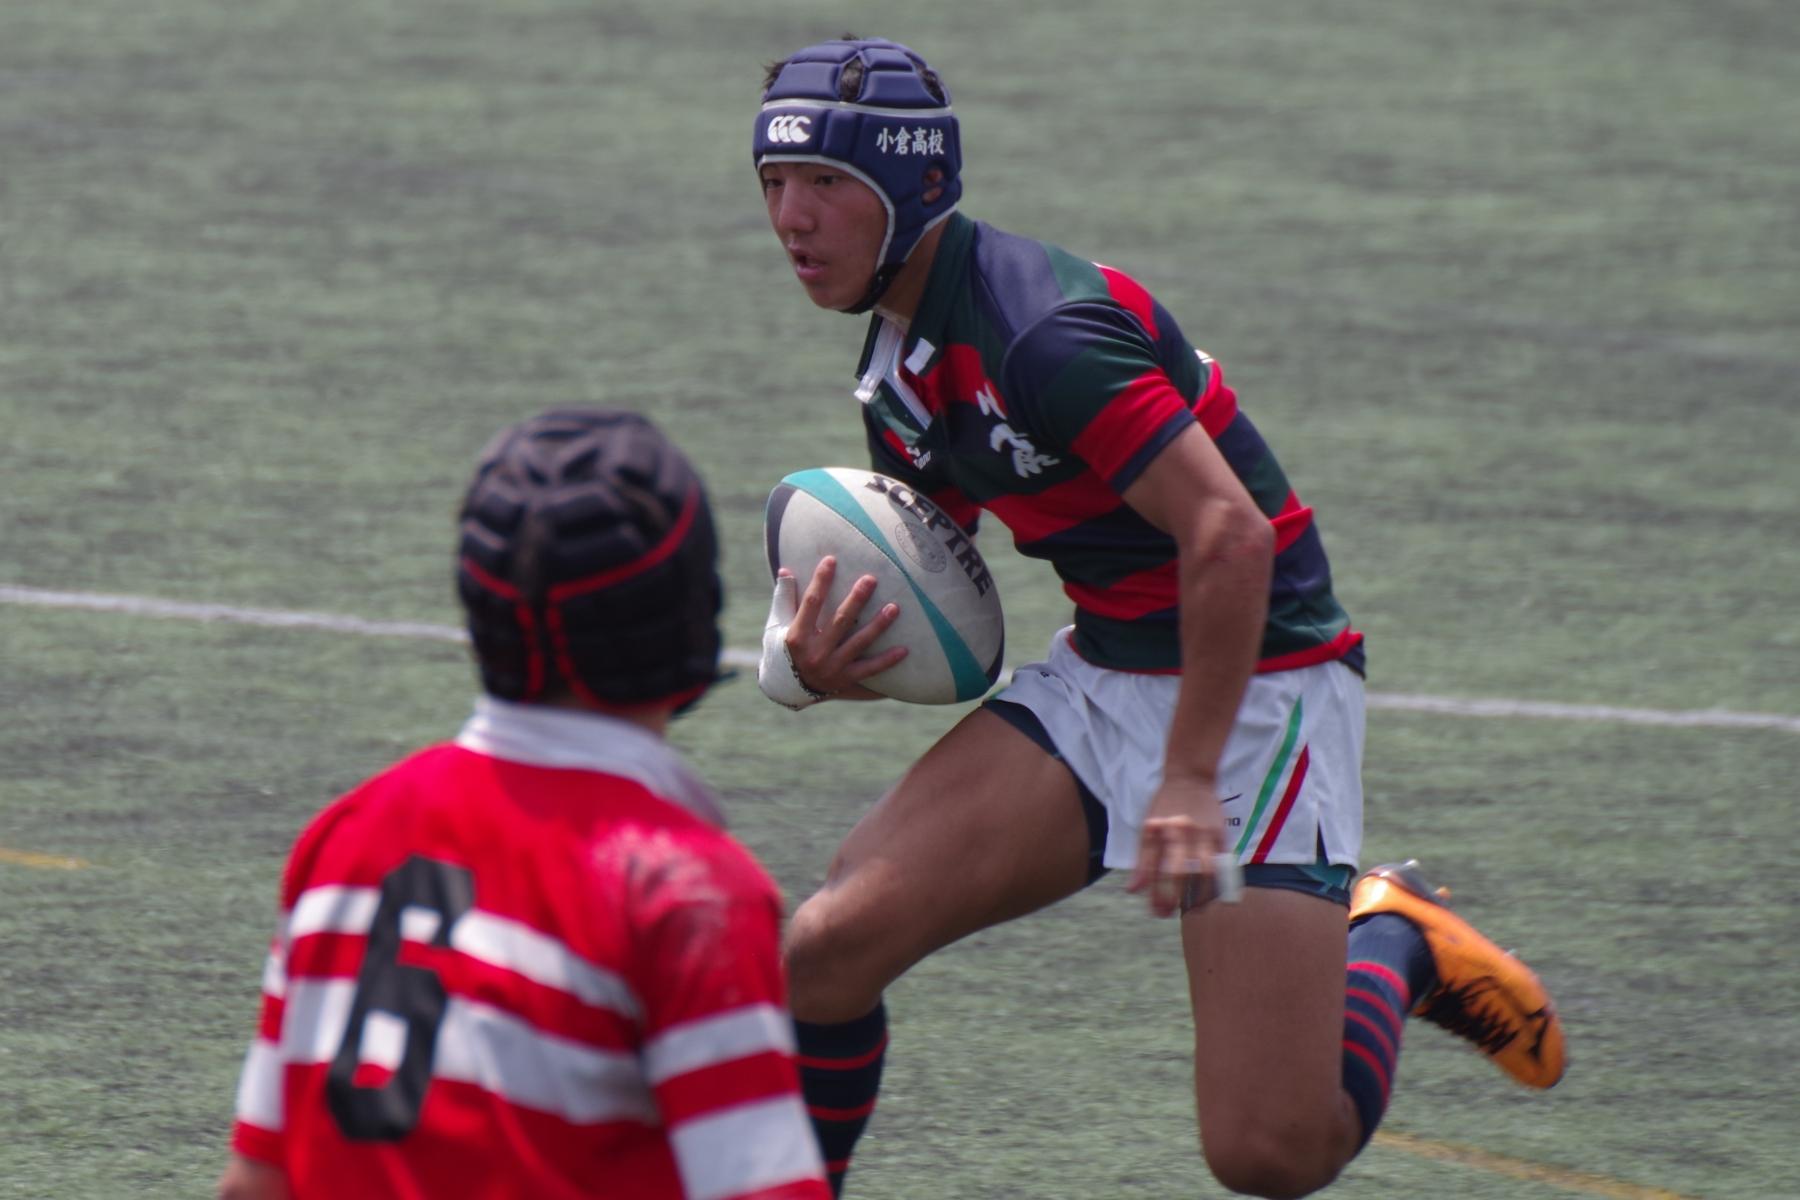 http://kokura-rugby.sakura.ne.jp/180609_131214_0625.jpg